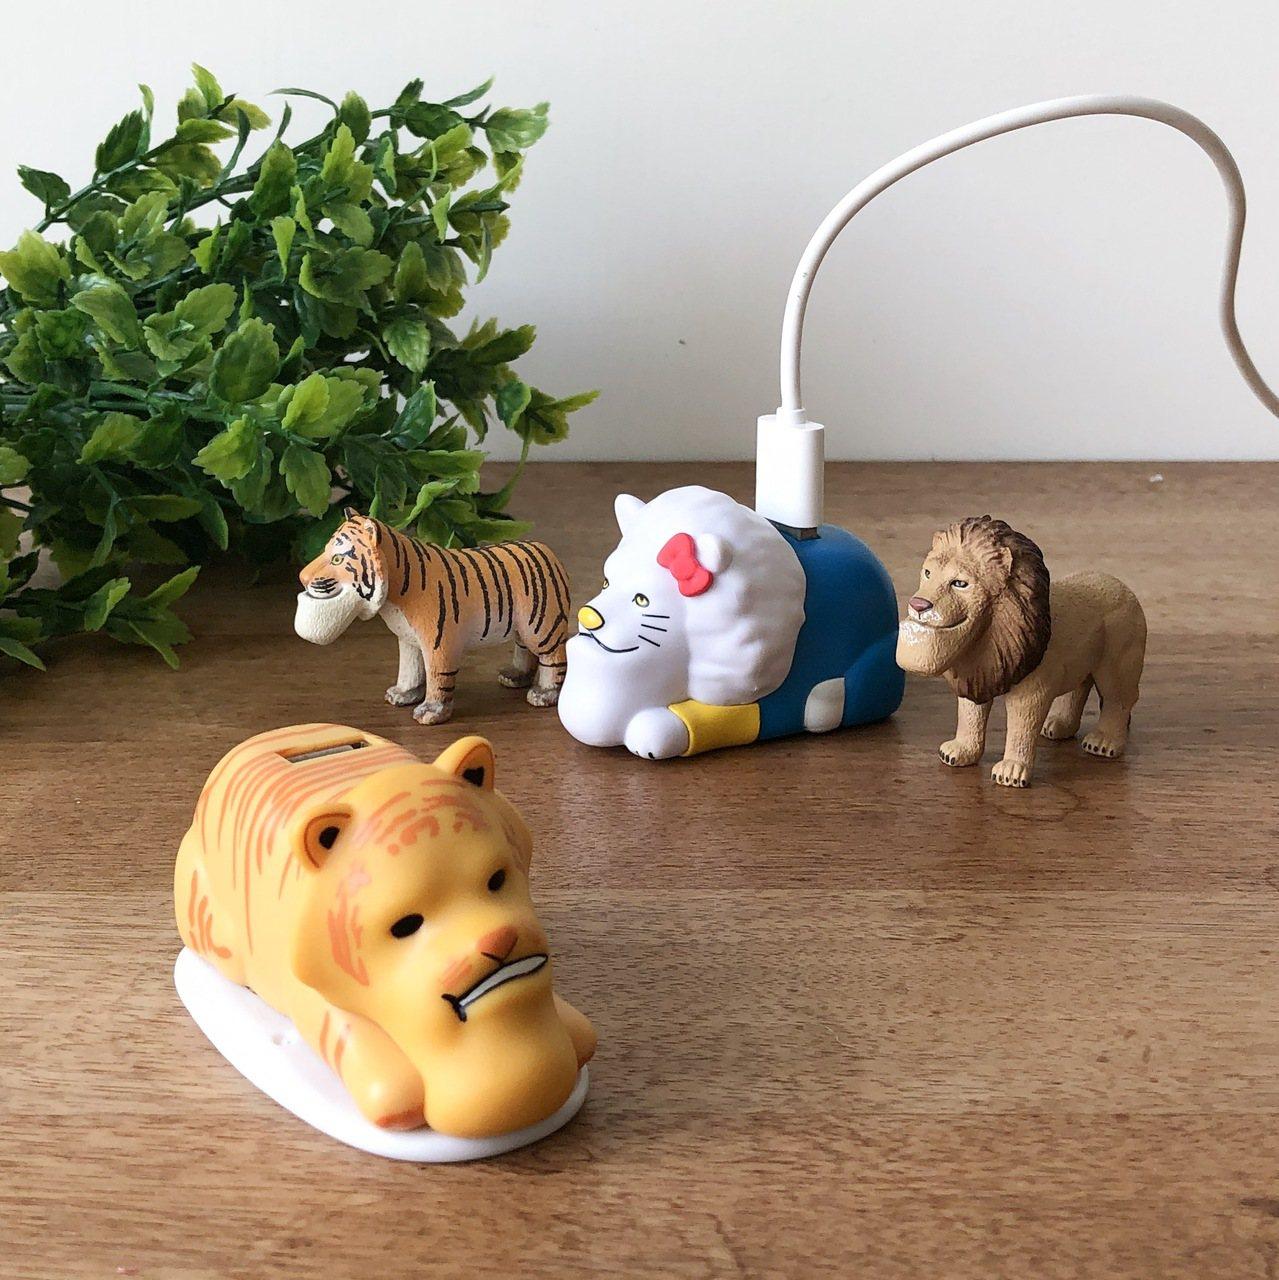 7-ELEVEN「三麗鷗X戽斗星球」CITY CAFE集點活動9月25日開跑,限...